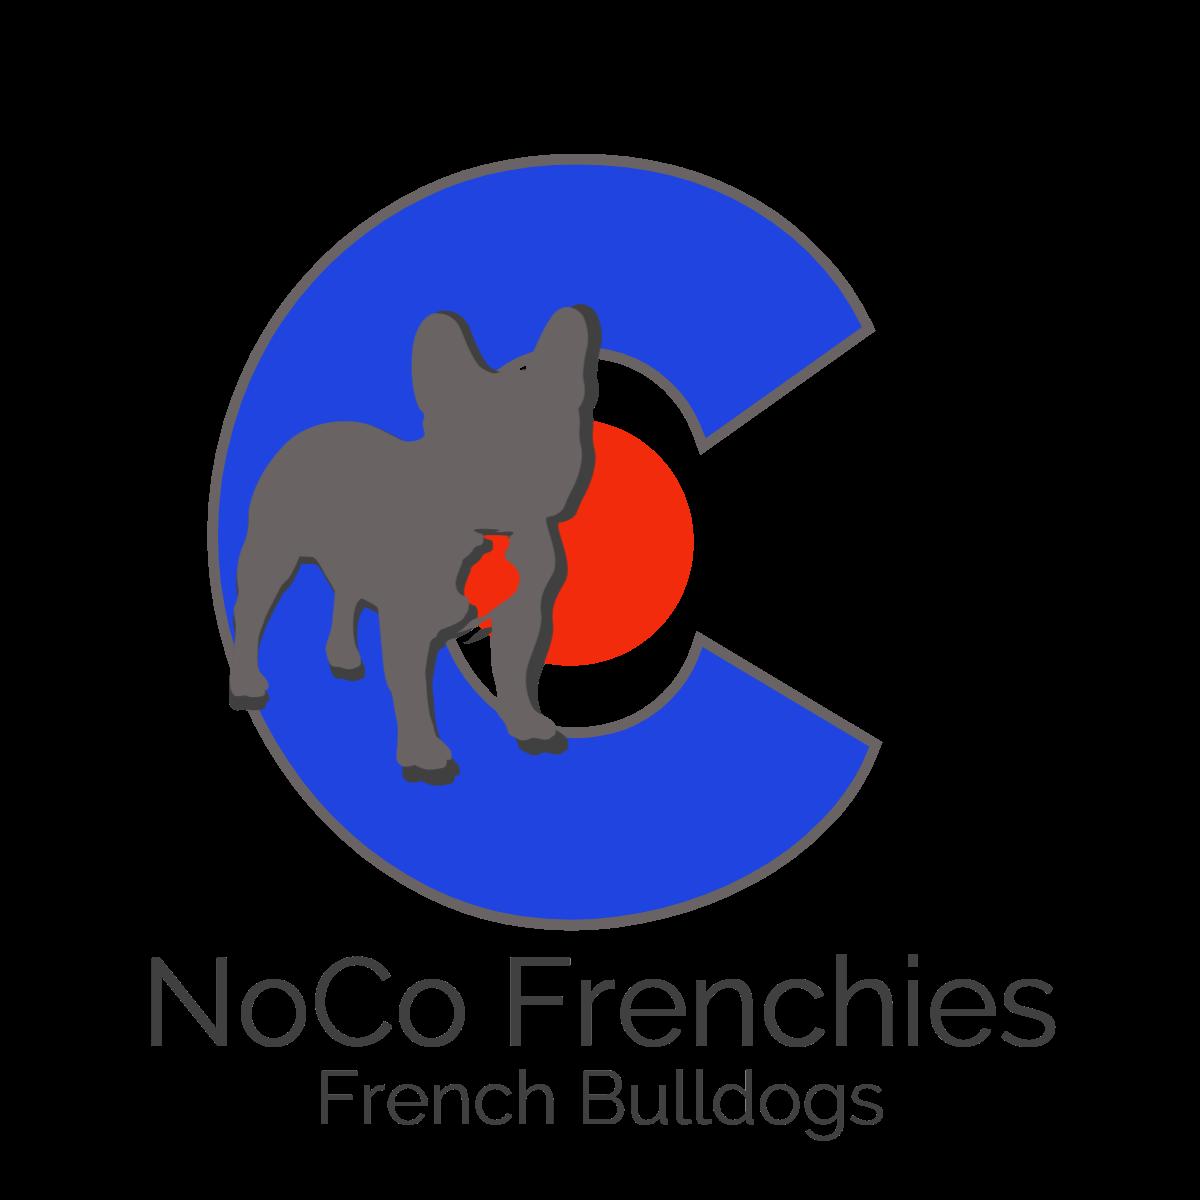 NoCo Frenchies